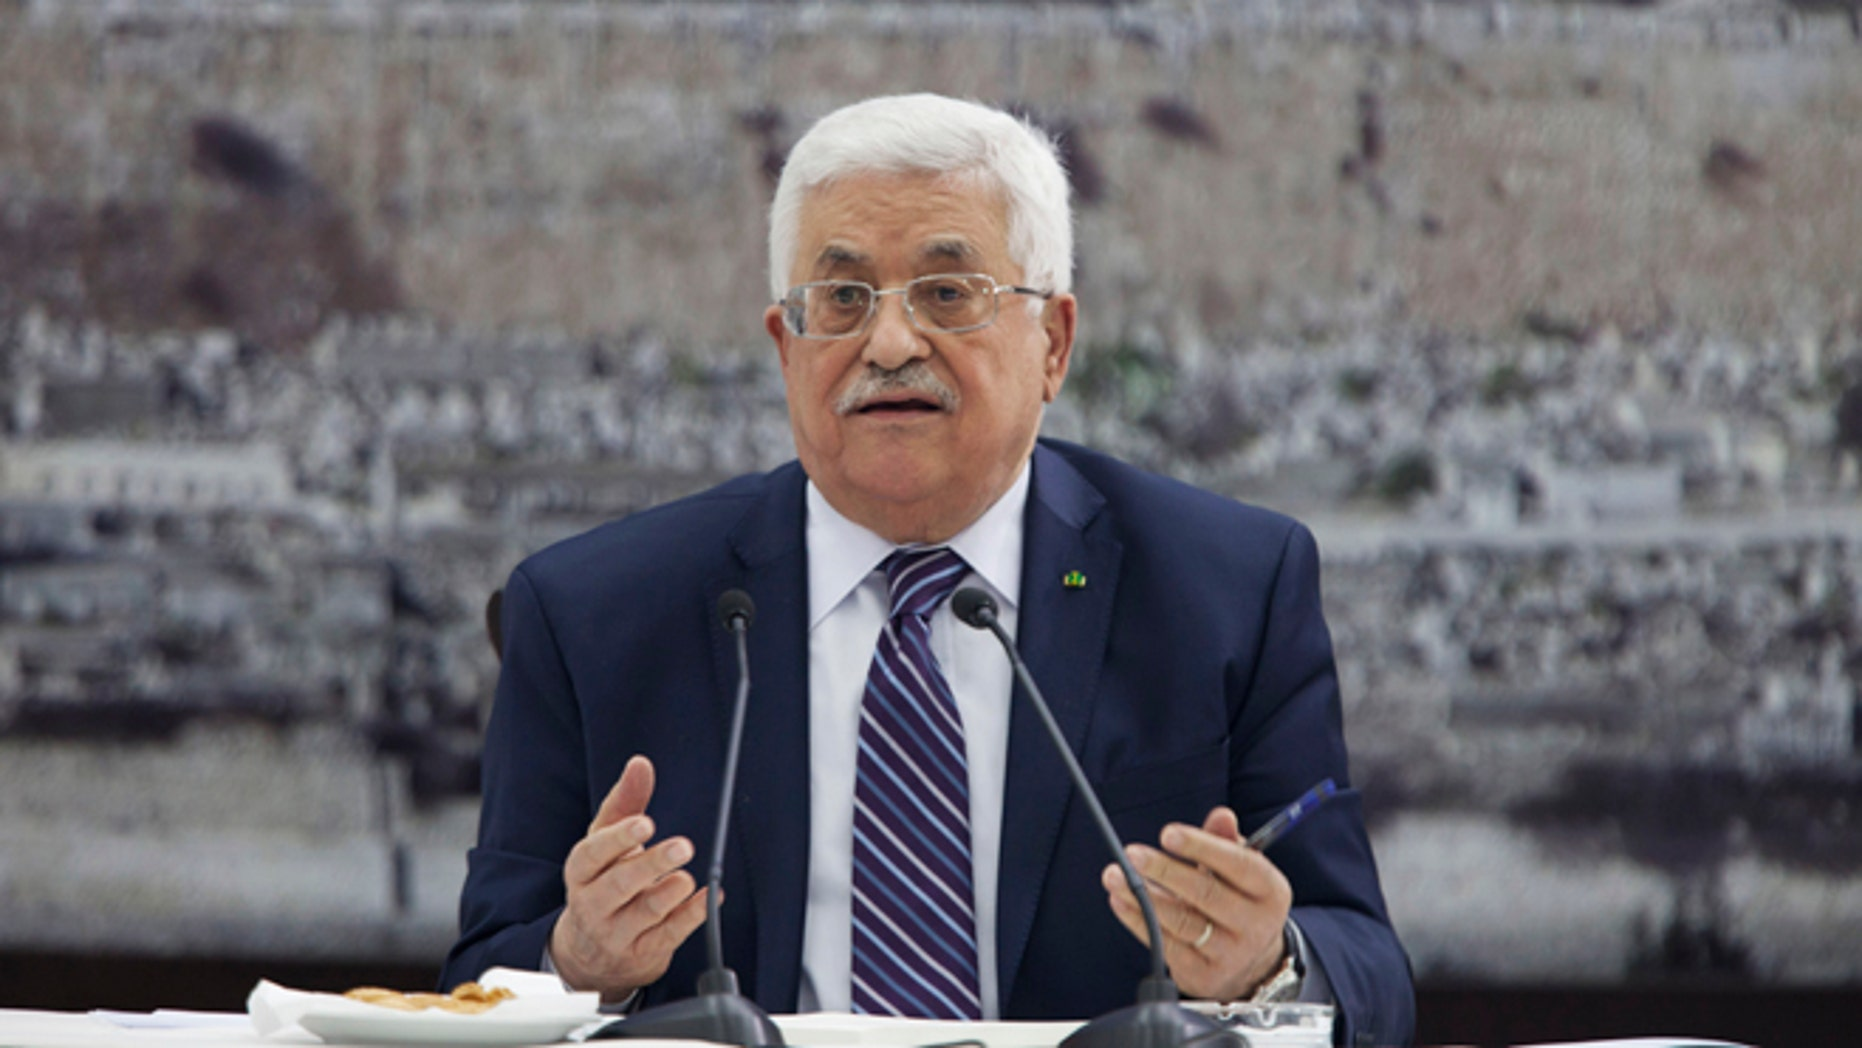 Apr.1 , 2014: Palestinian President Mahmoud Abbas talks during a leadership meeting in Ramallah.